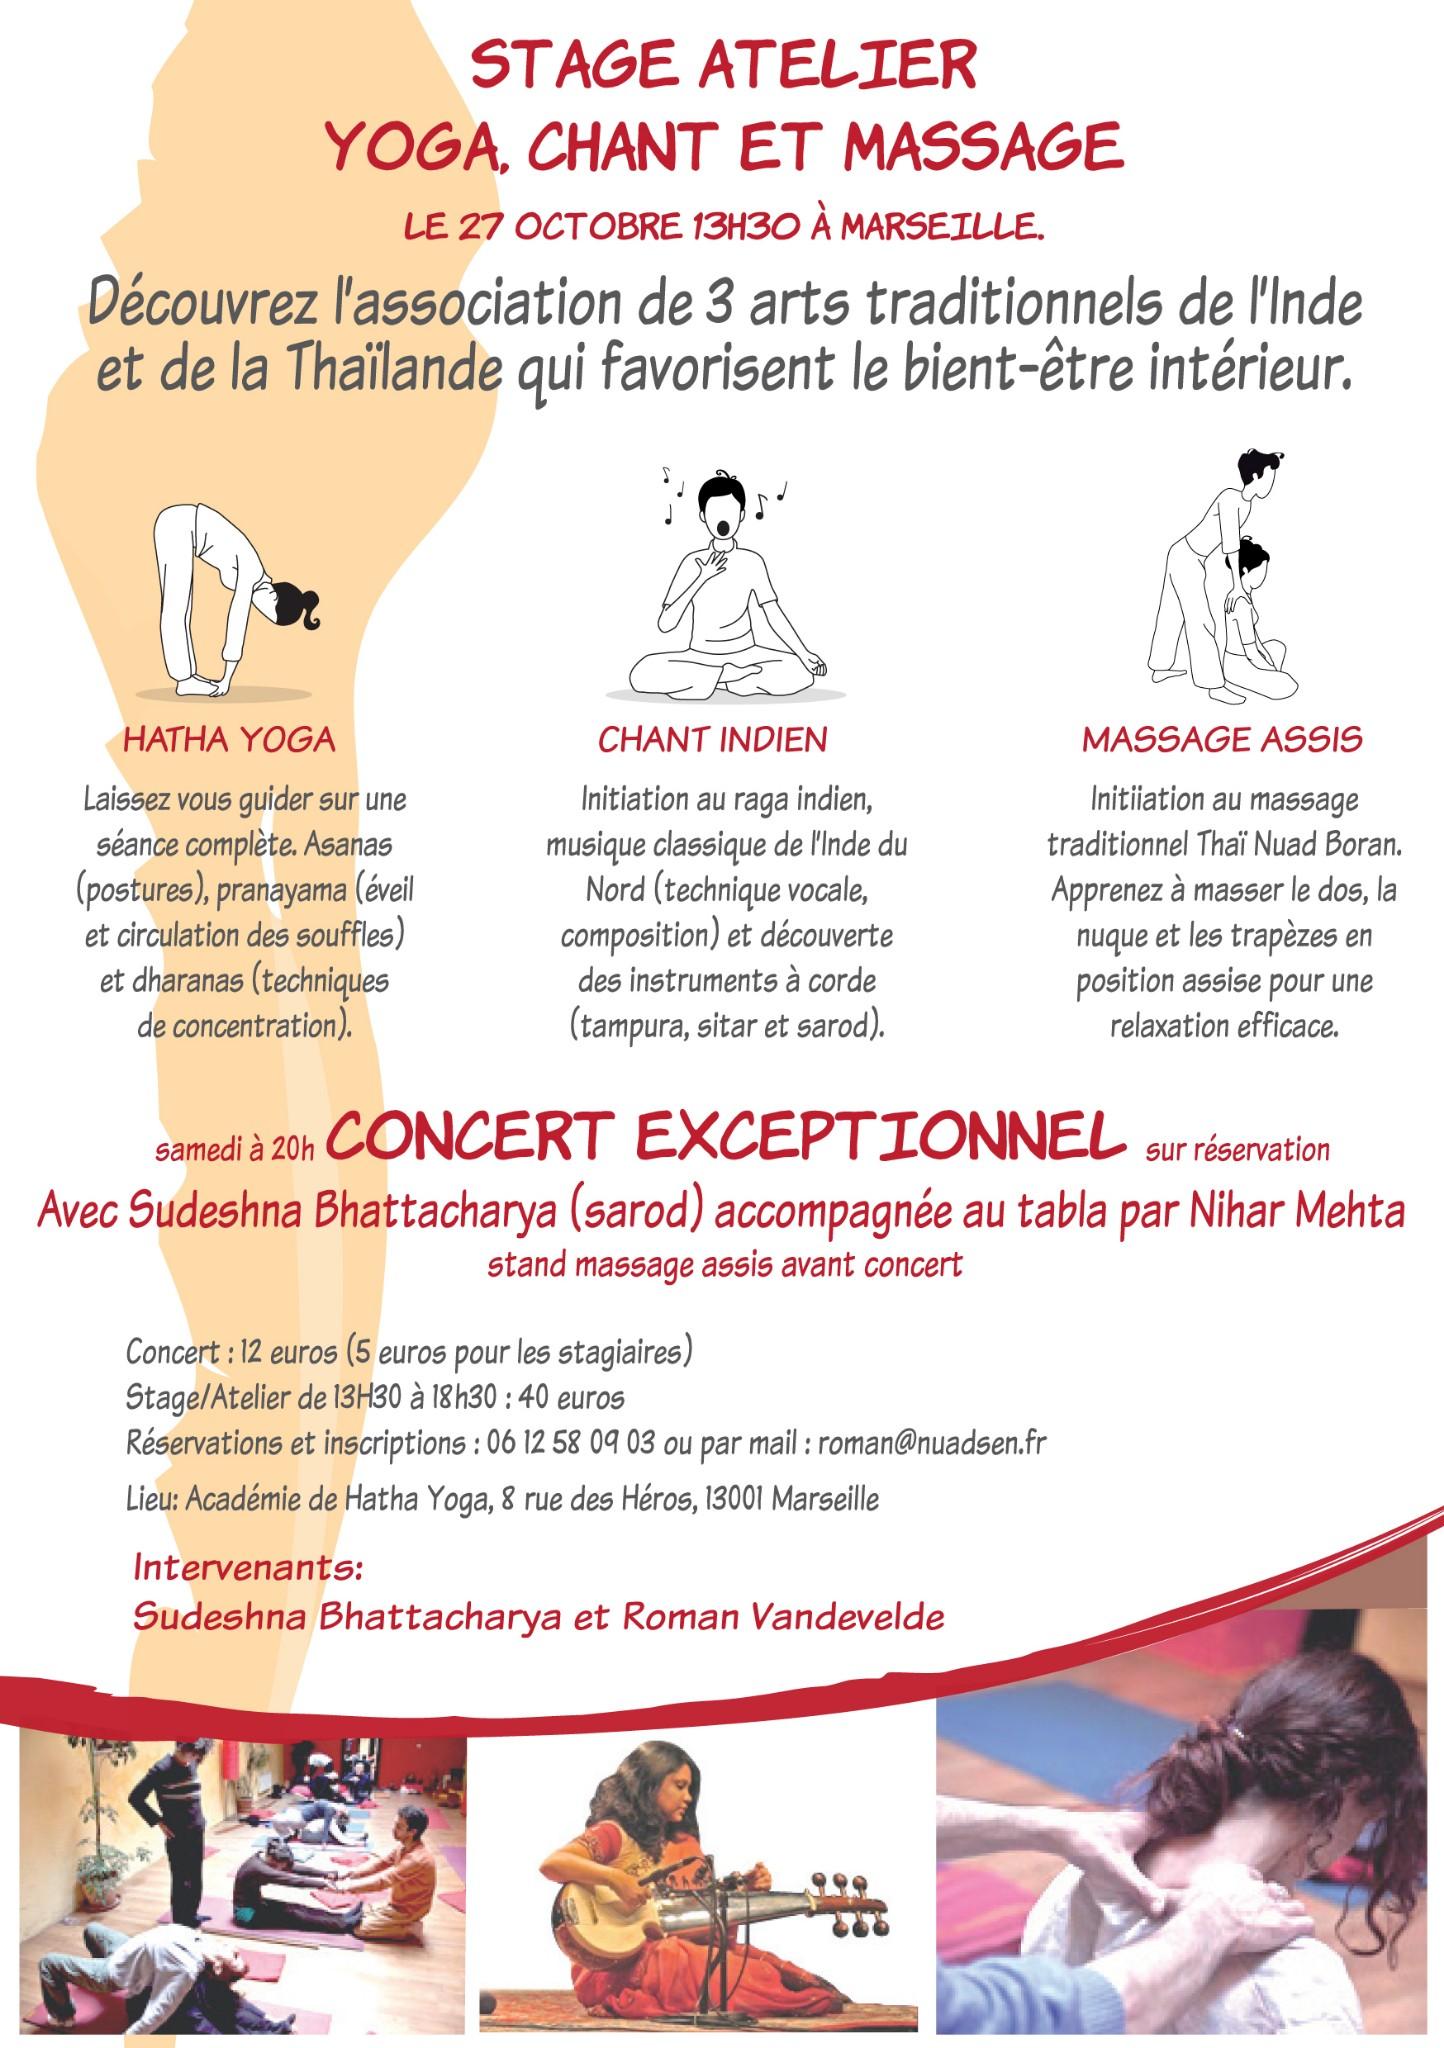 Photo: Sudeshna - 27. October, Marseille, Workshop, concert.